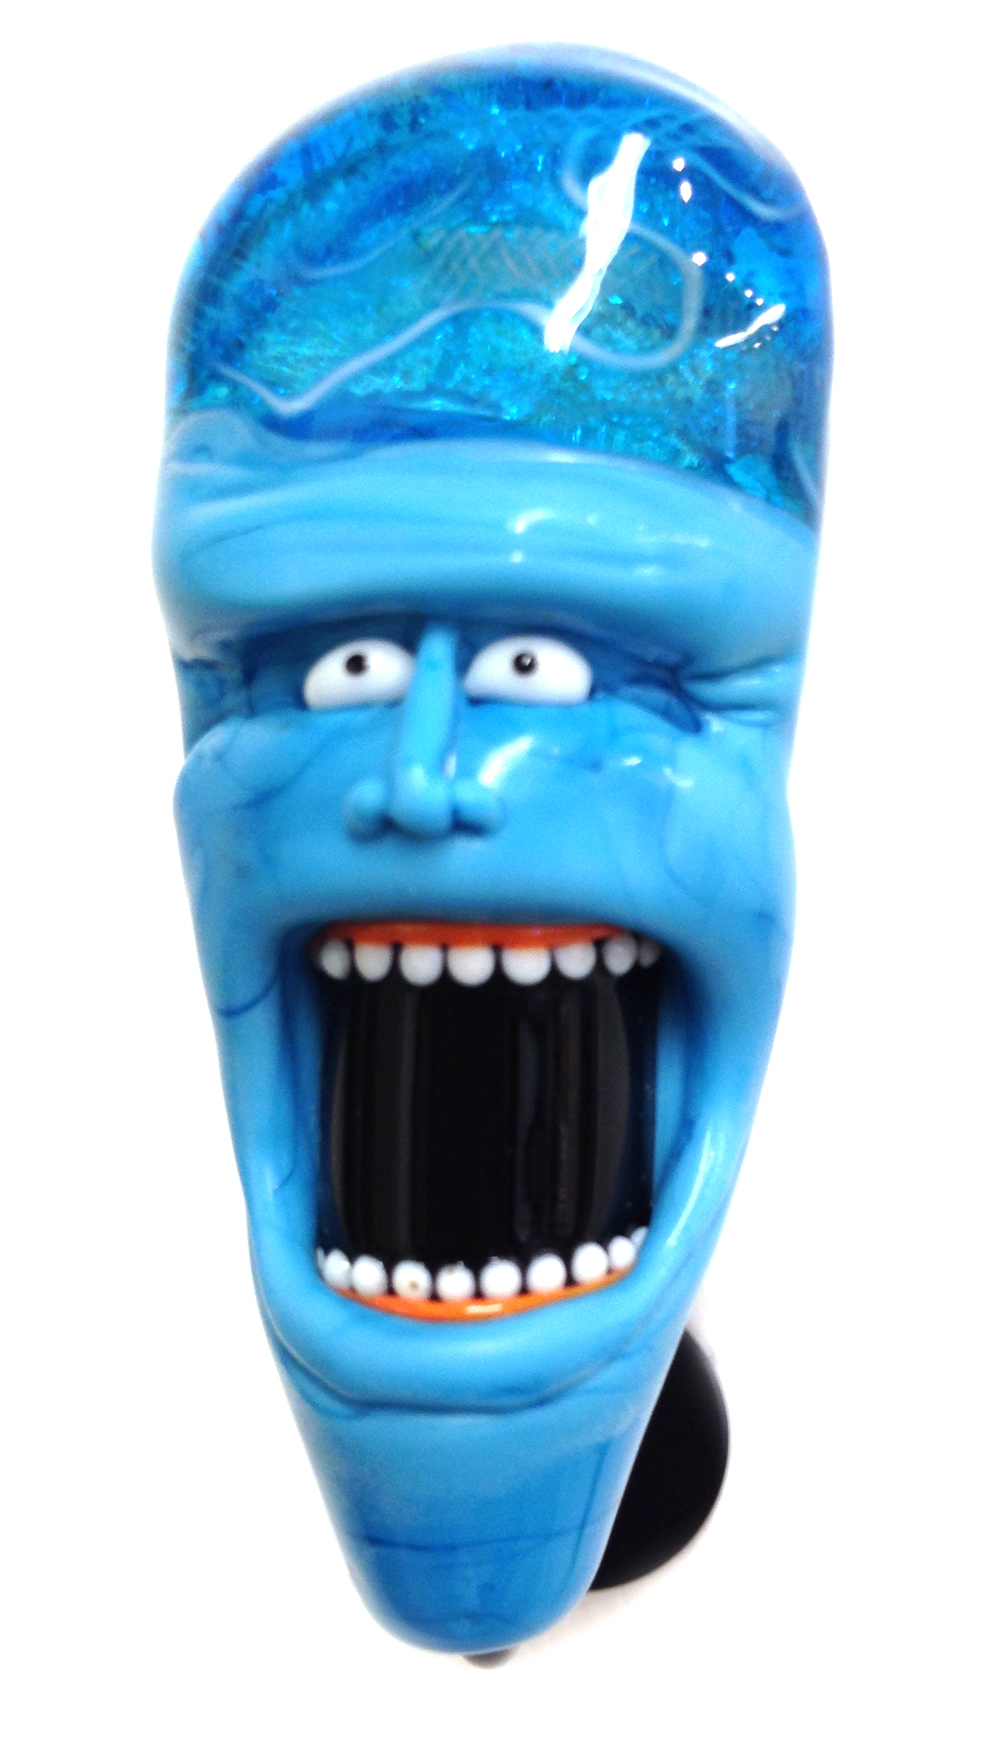 Mr Screaming Bluehead - KarenWoodwardStudios.com